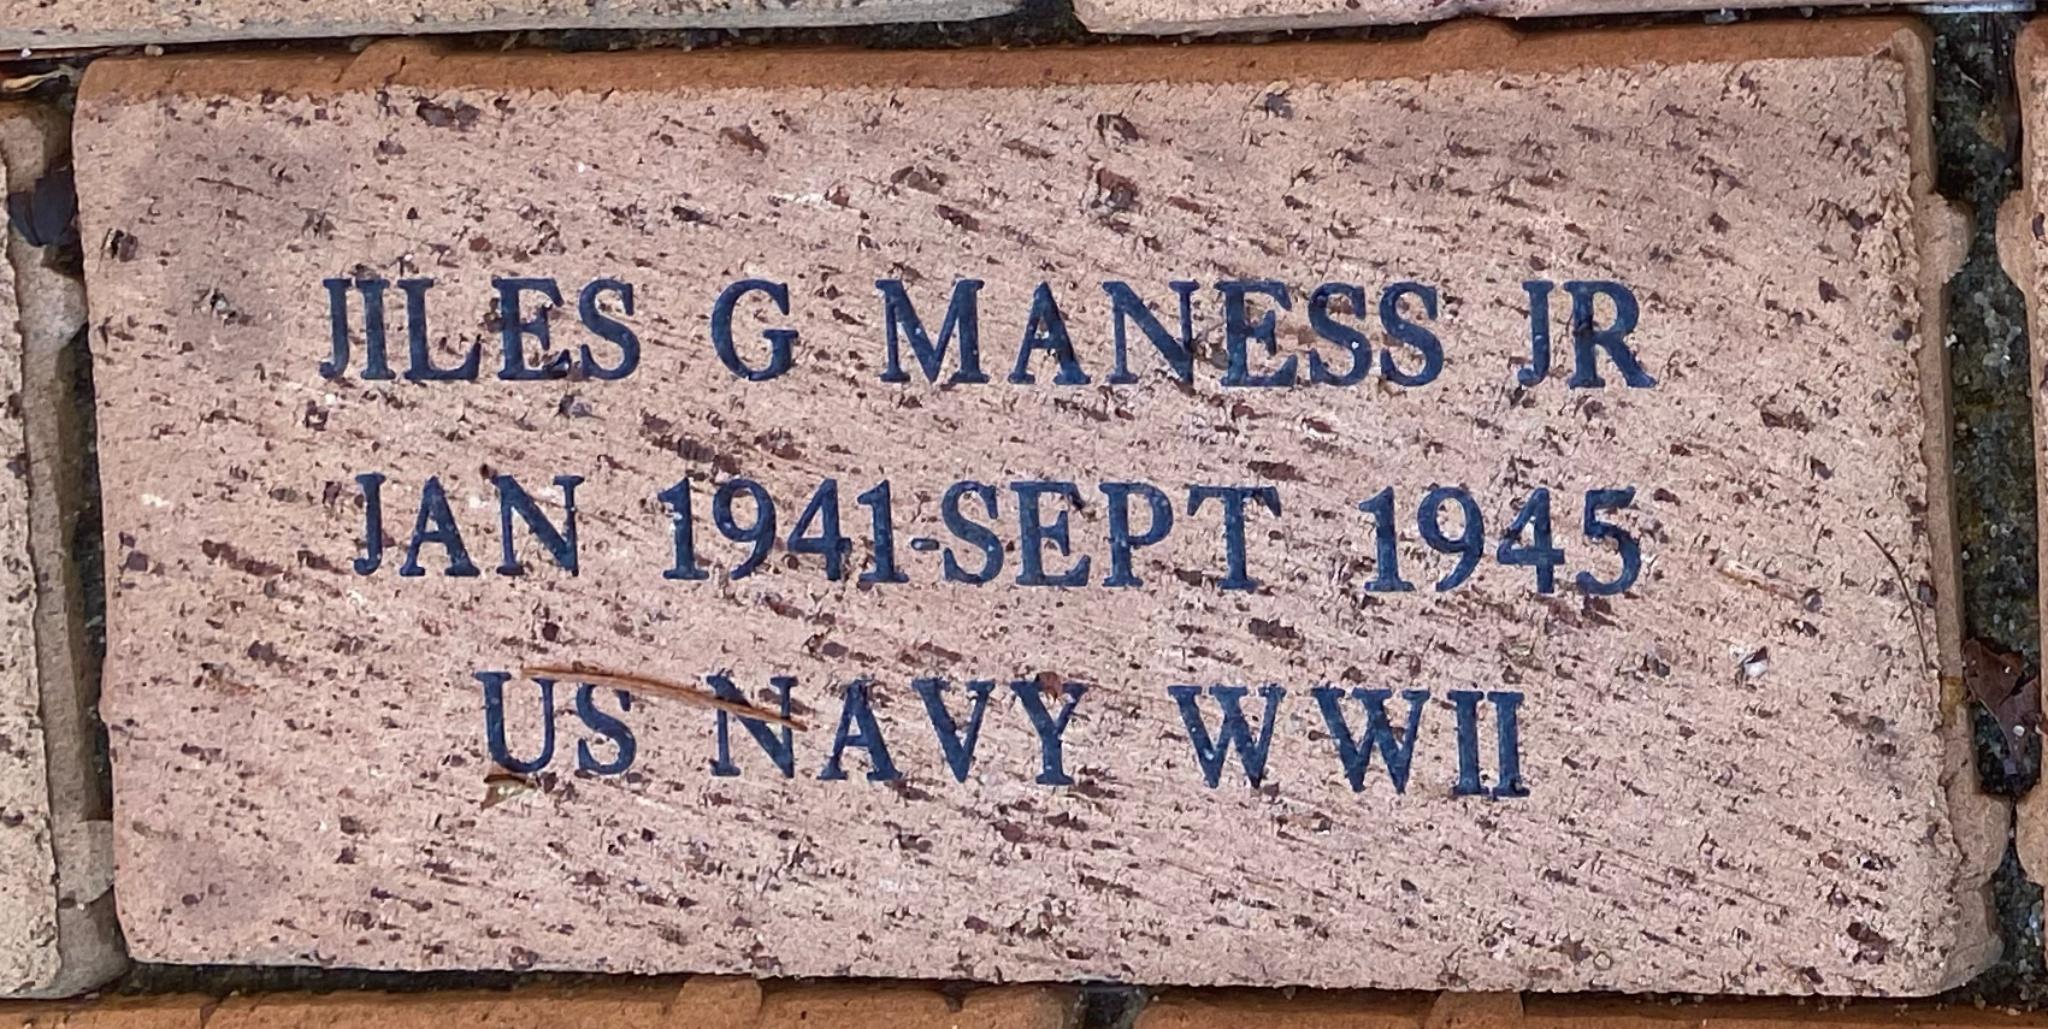 JILES G MANESS JR JAN 1941-SEPT 1945 US NAVY WWII